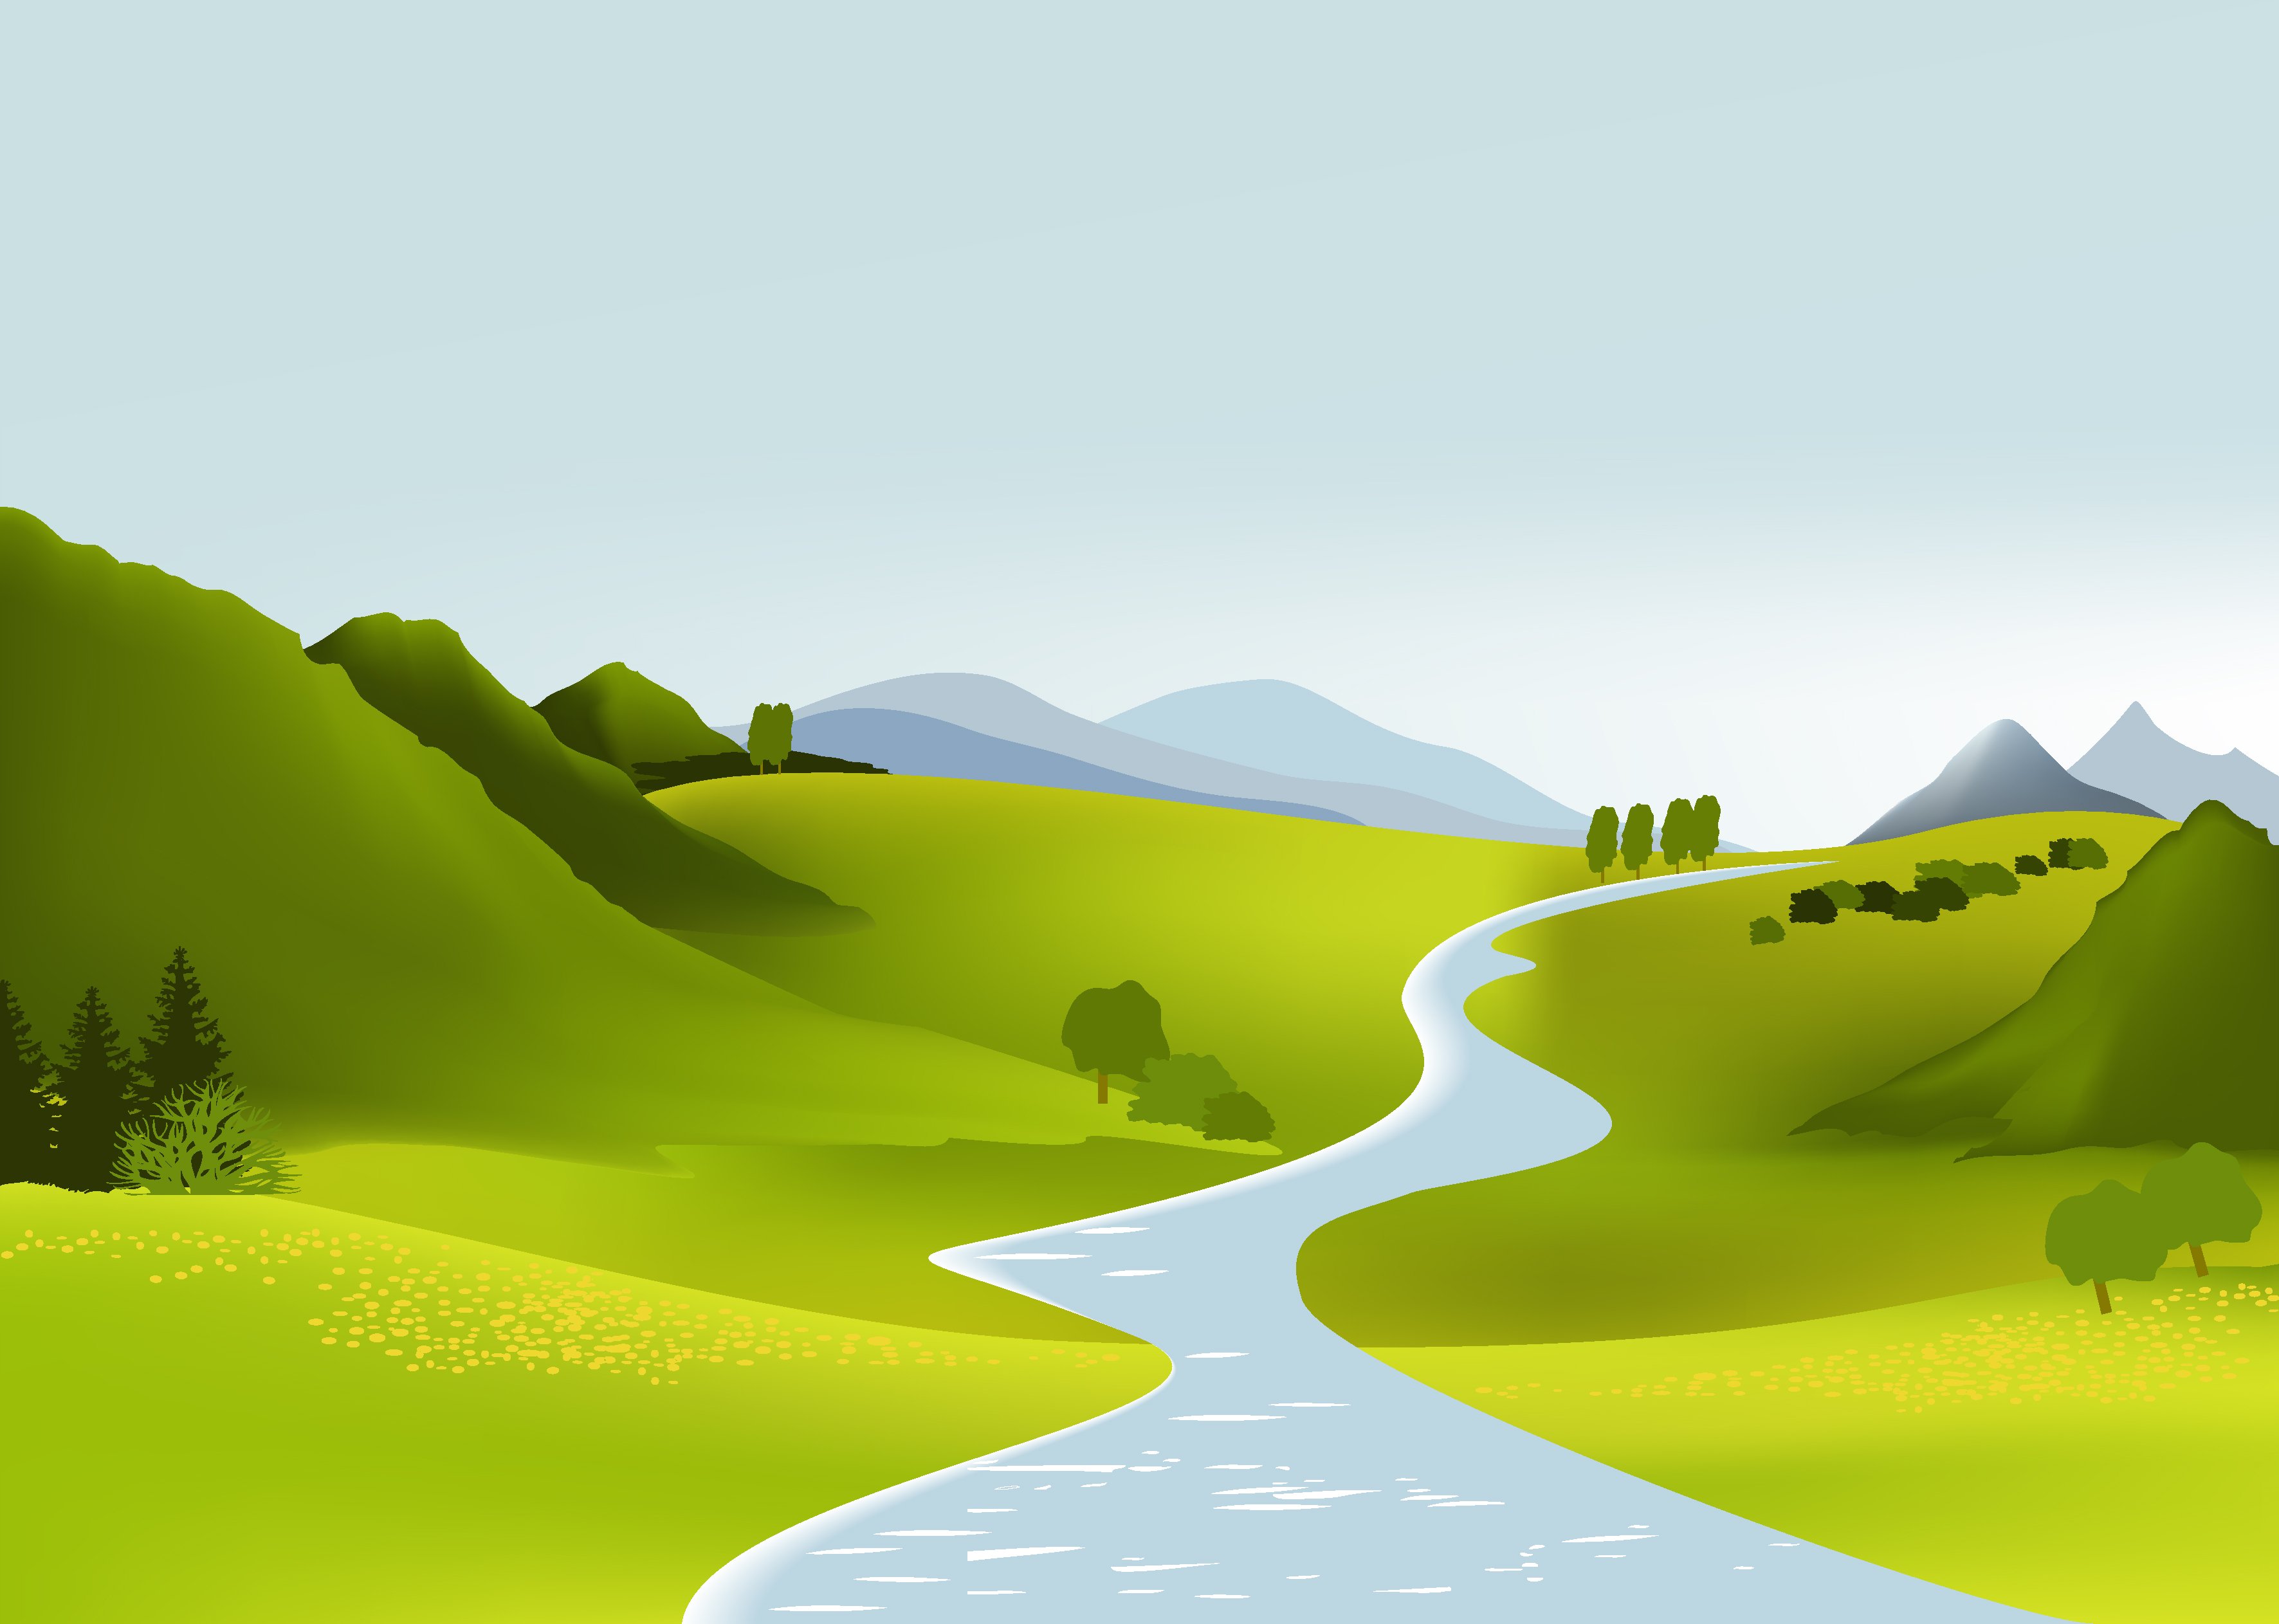 11 Cartoon Landscape Vector Images